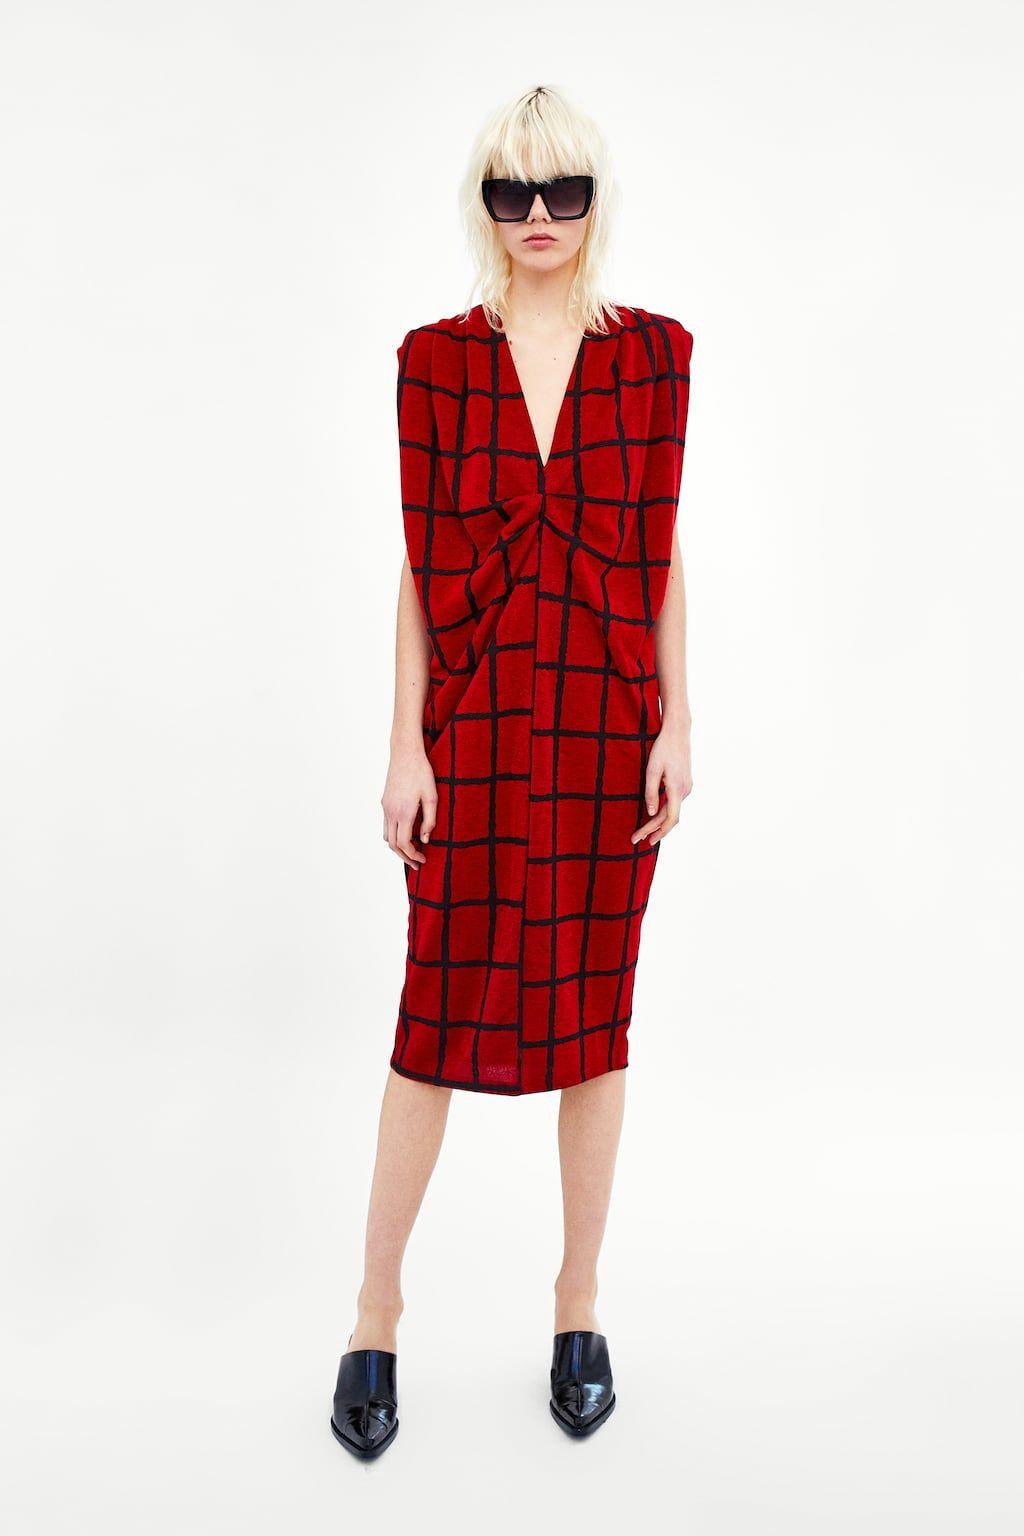 Vestido Cuadros Pliegue Hombros Tuch Kariertes Kleid Modestil